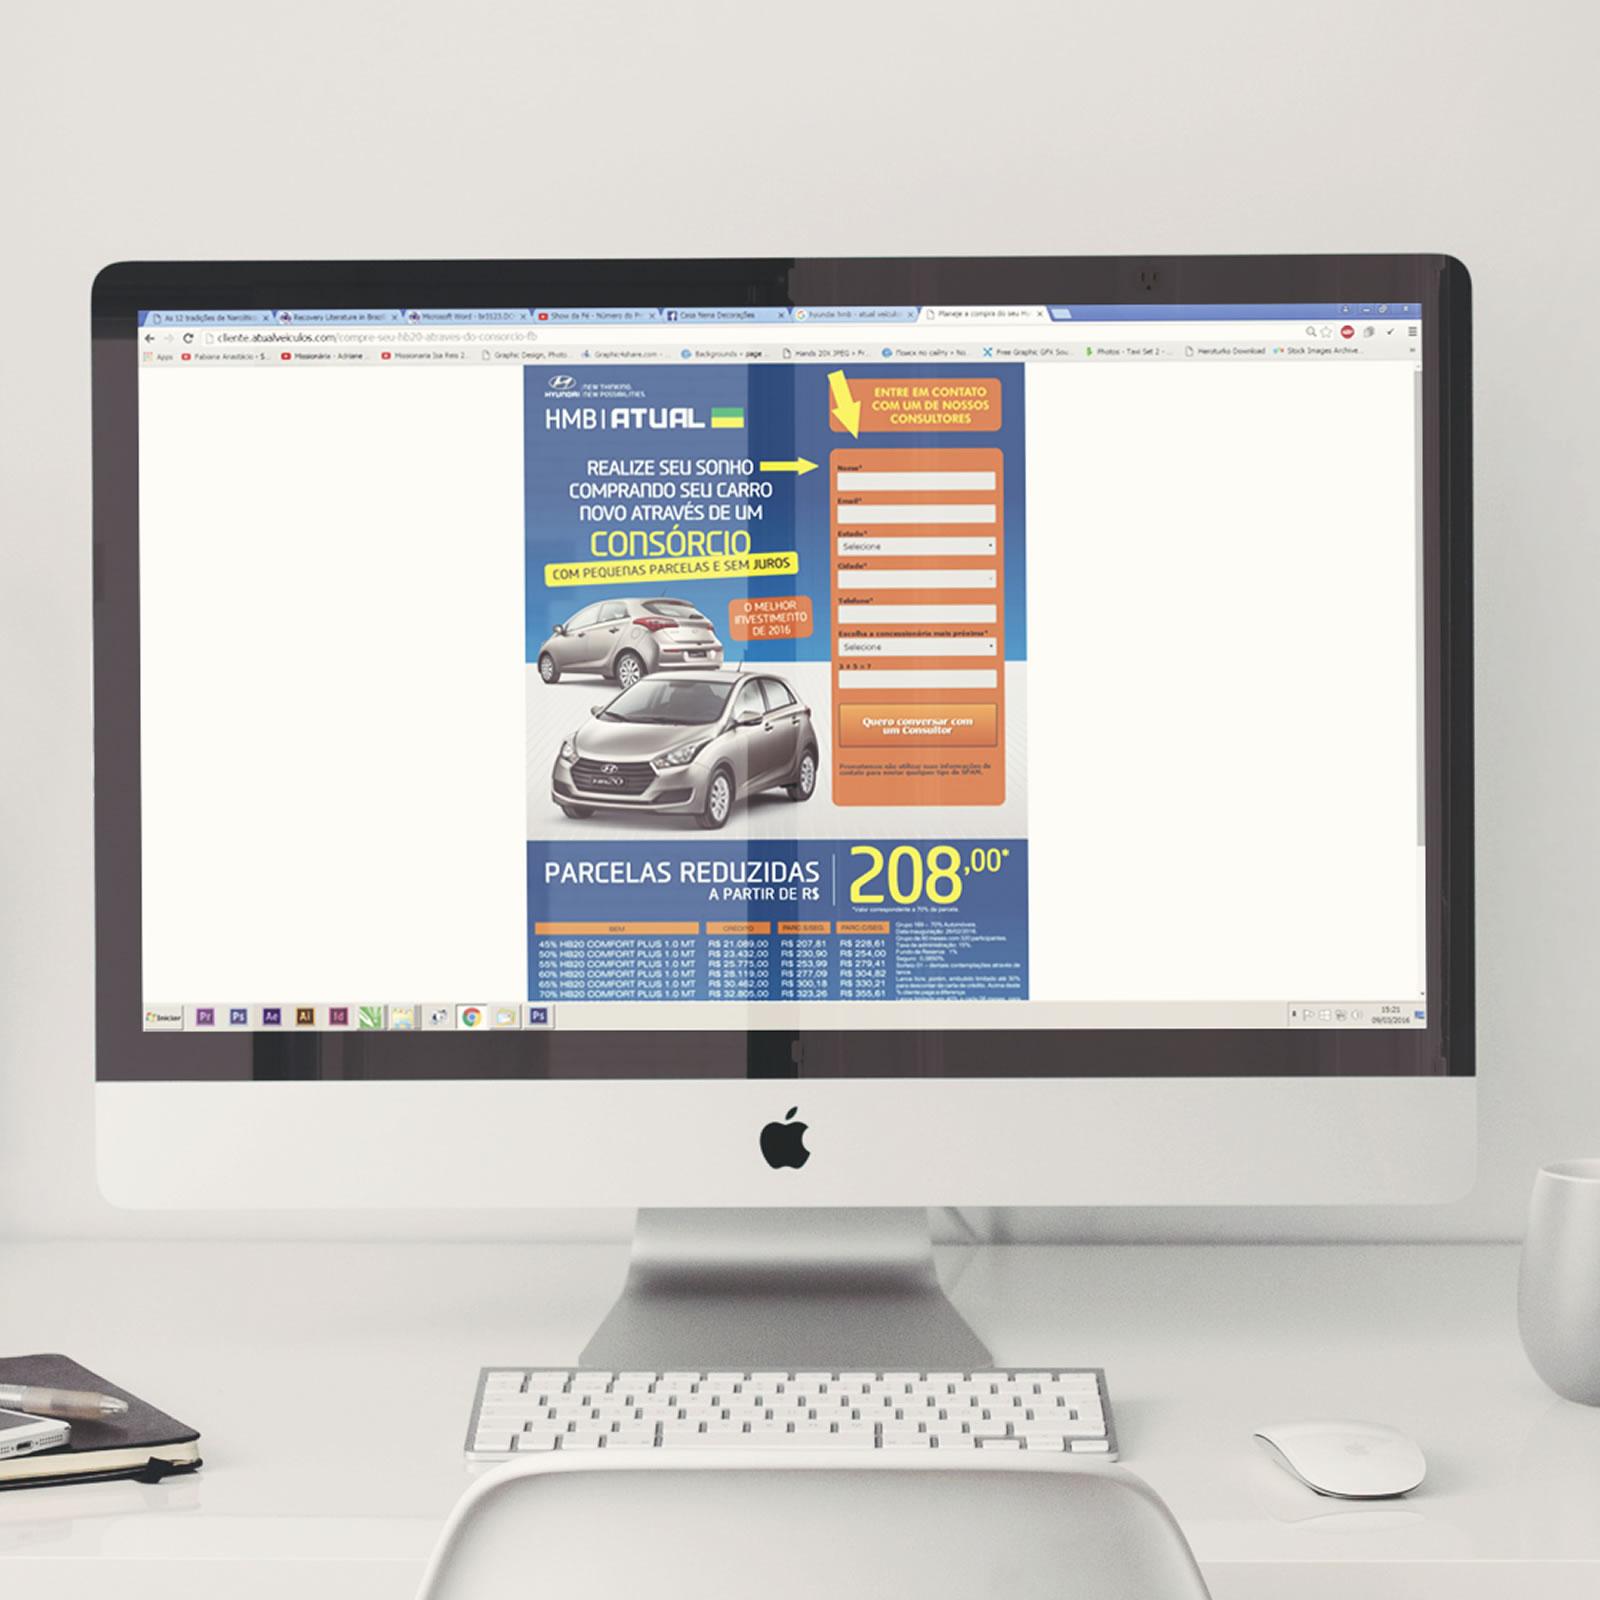 Landing Page | Hyundai Atual Veículos | Consórcio